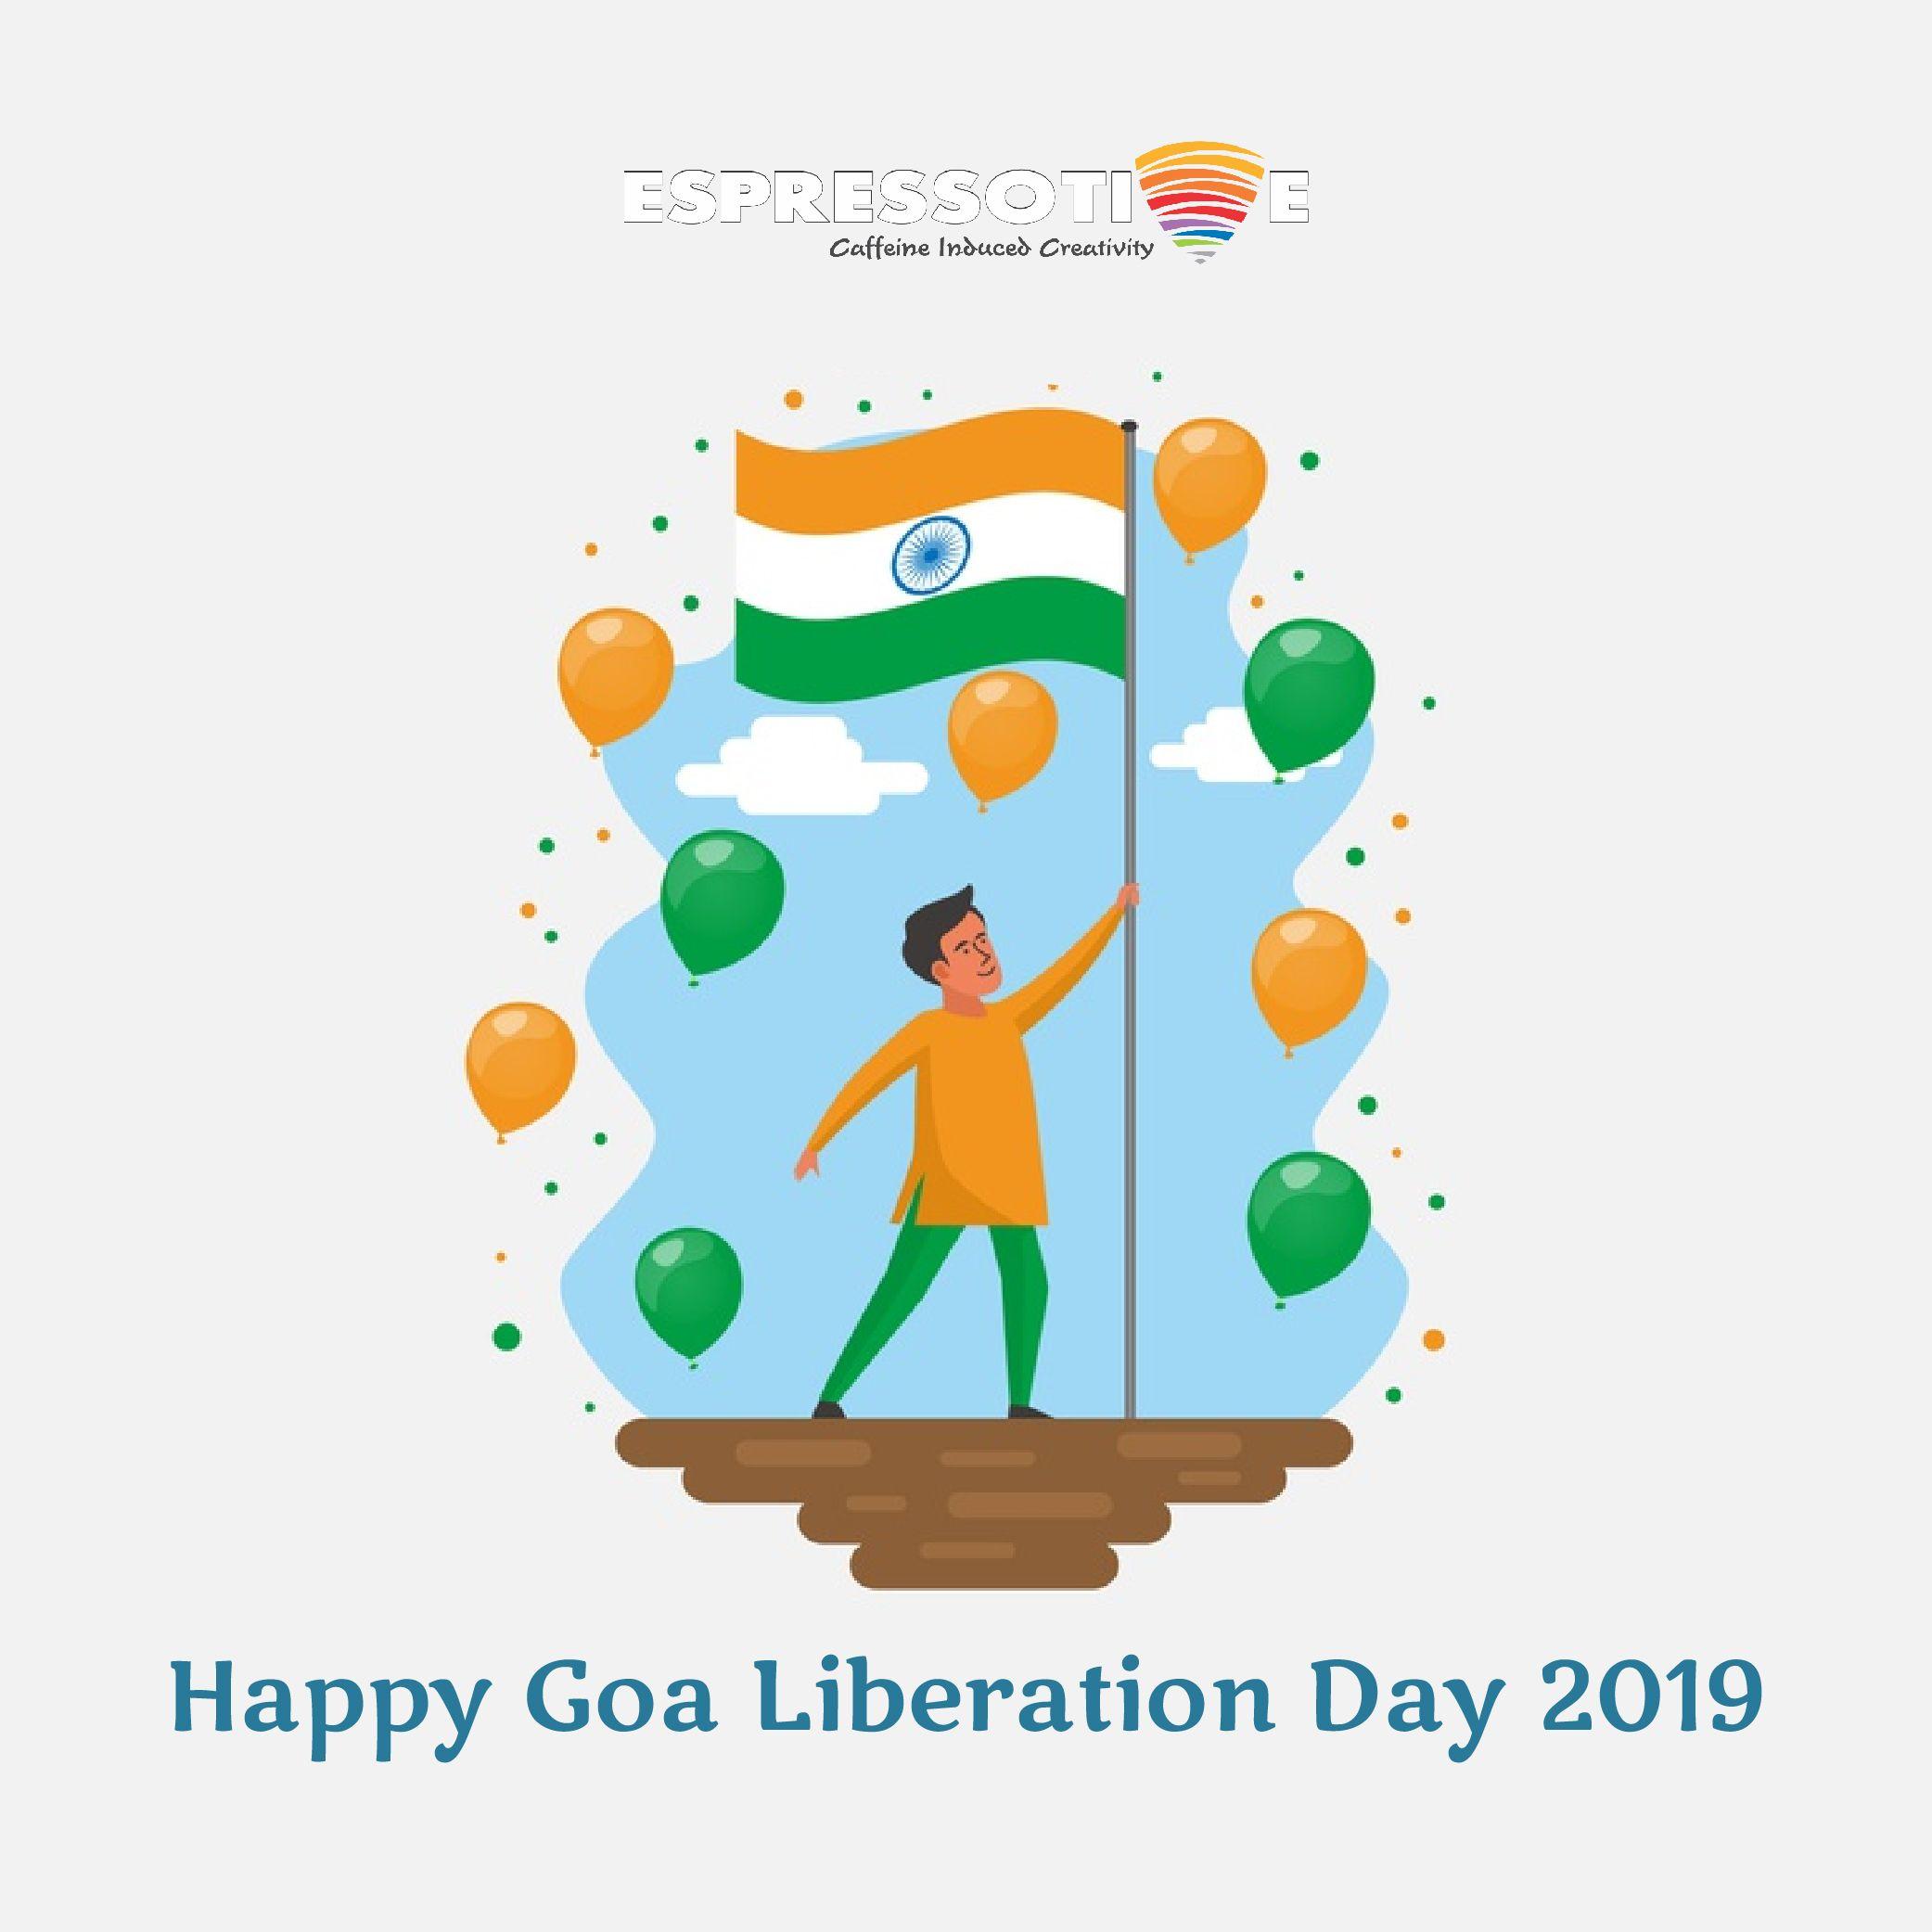 Team Espressotive Wishes Everyone Happy Liberation Day